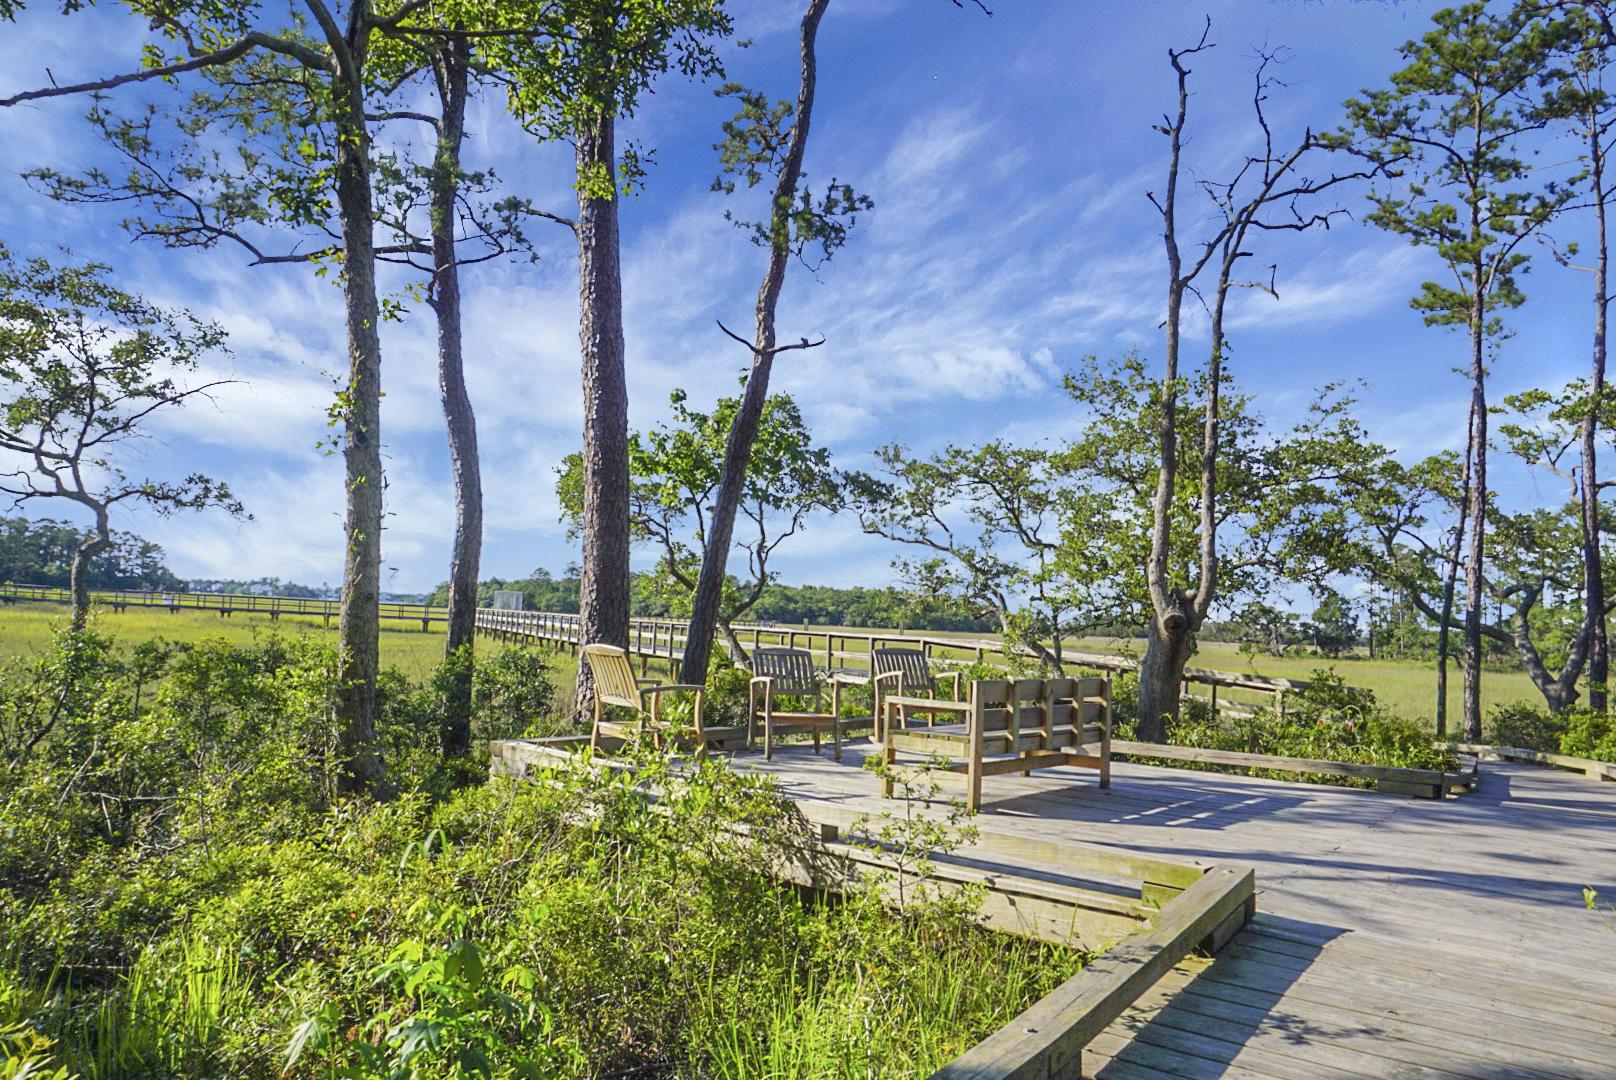 Etiwan Pointe Homes For Sale - 269 Etiwan Pointe, Mount Pleasant, SC - 9